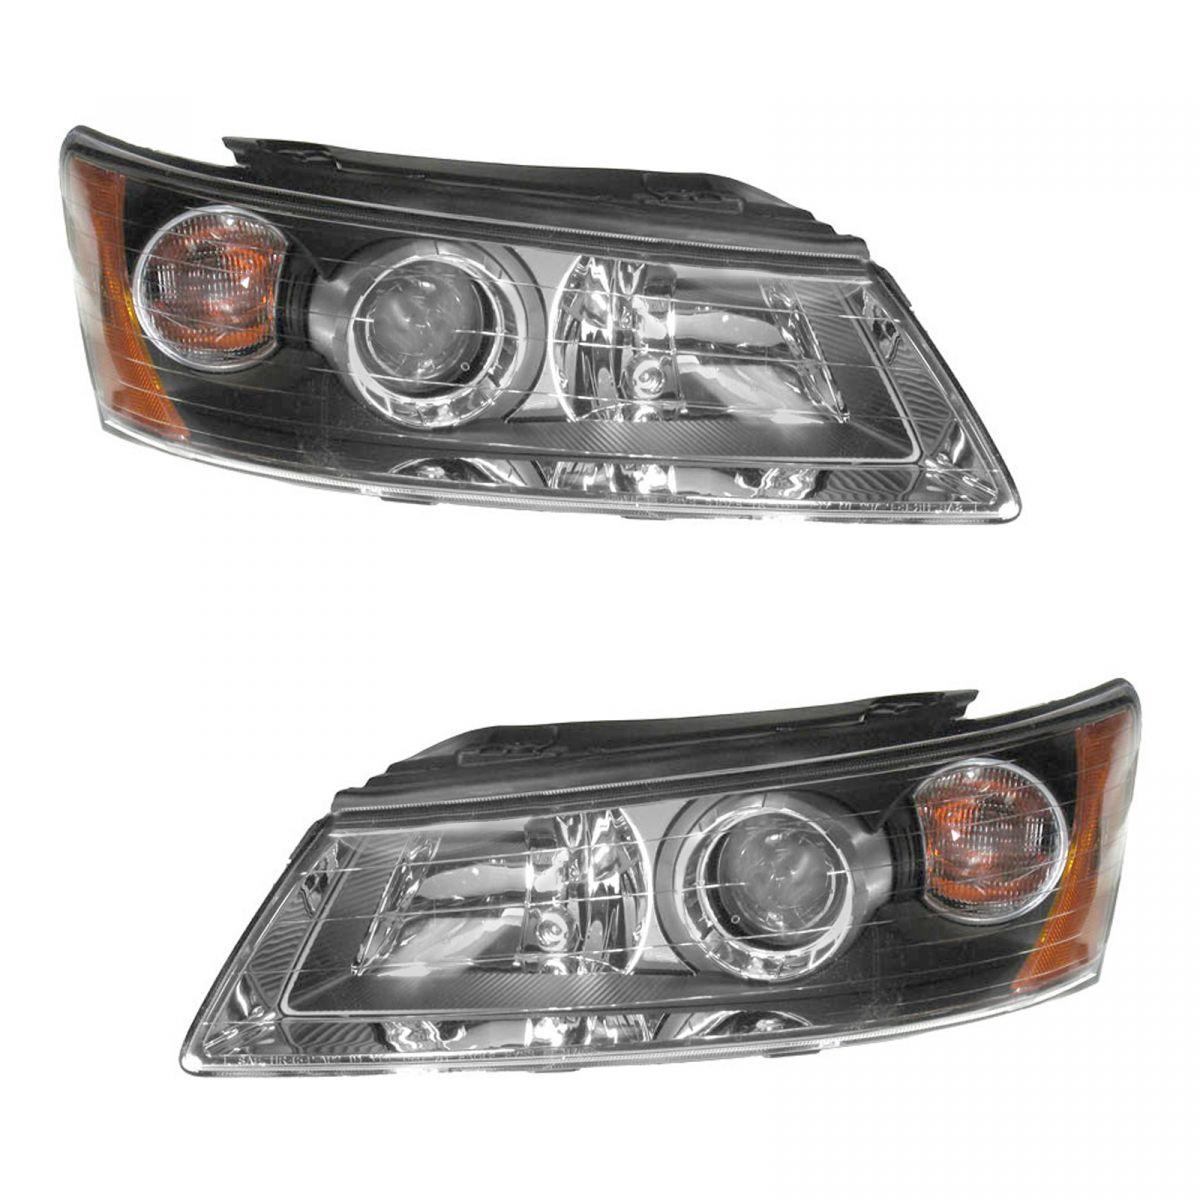 Headlights Headlamps Left & Right Pair Set for 06-08 Hyundai Sonata